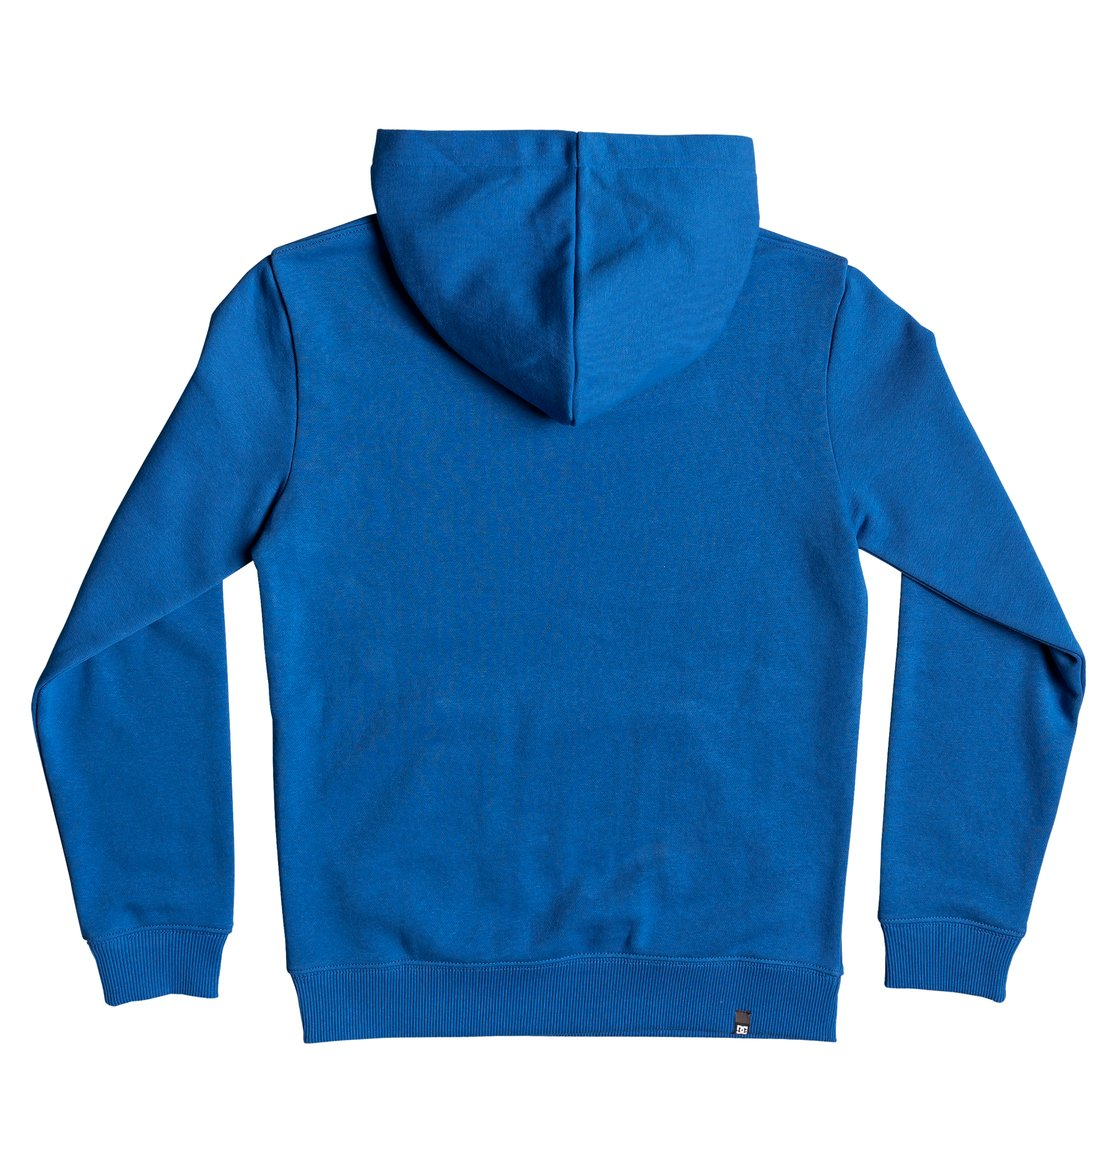 27ee3e62557ba 1 Star - Sweat à capuche pour Garçon 8-16 ans Bleu EDBSF03087 ...